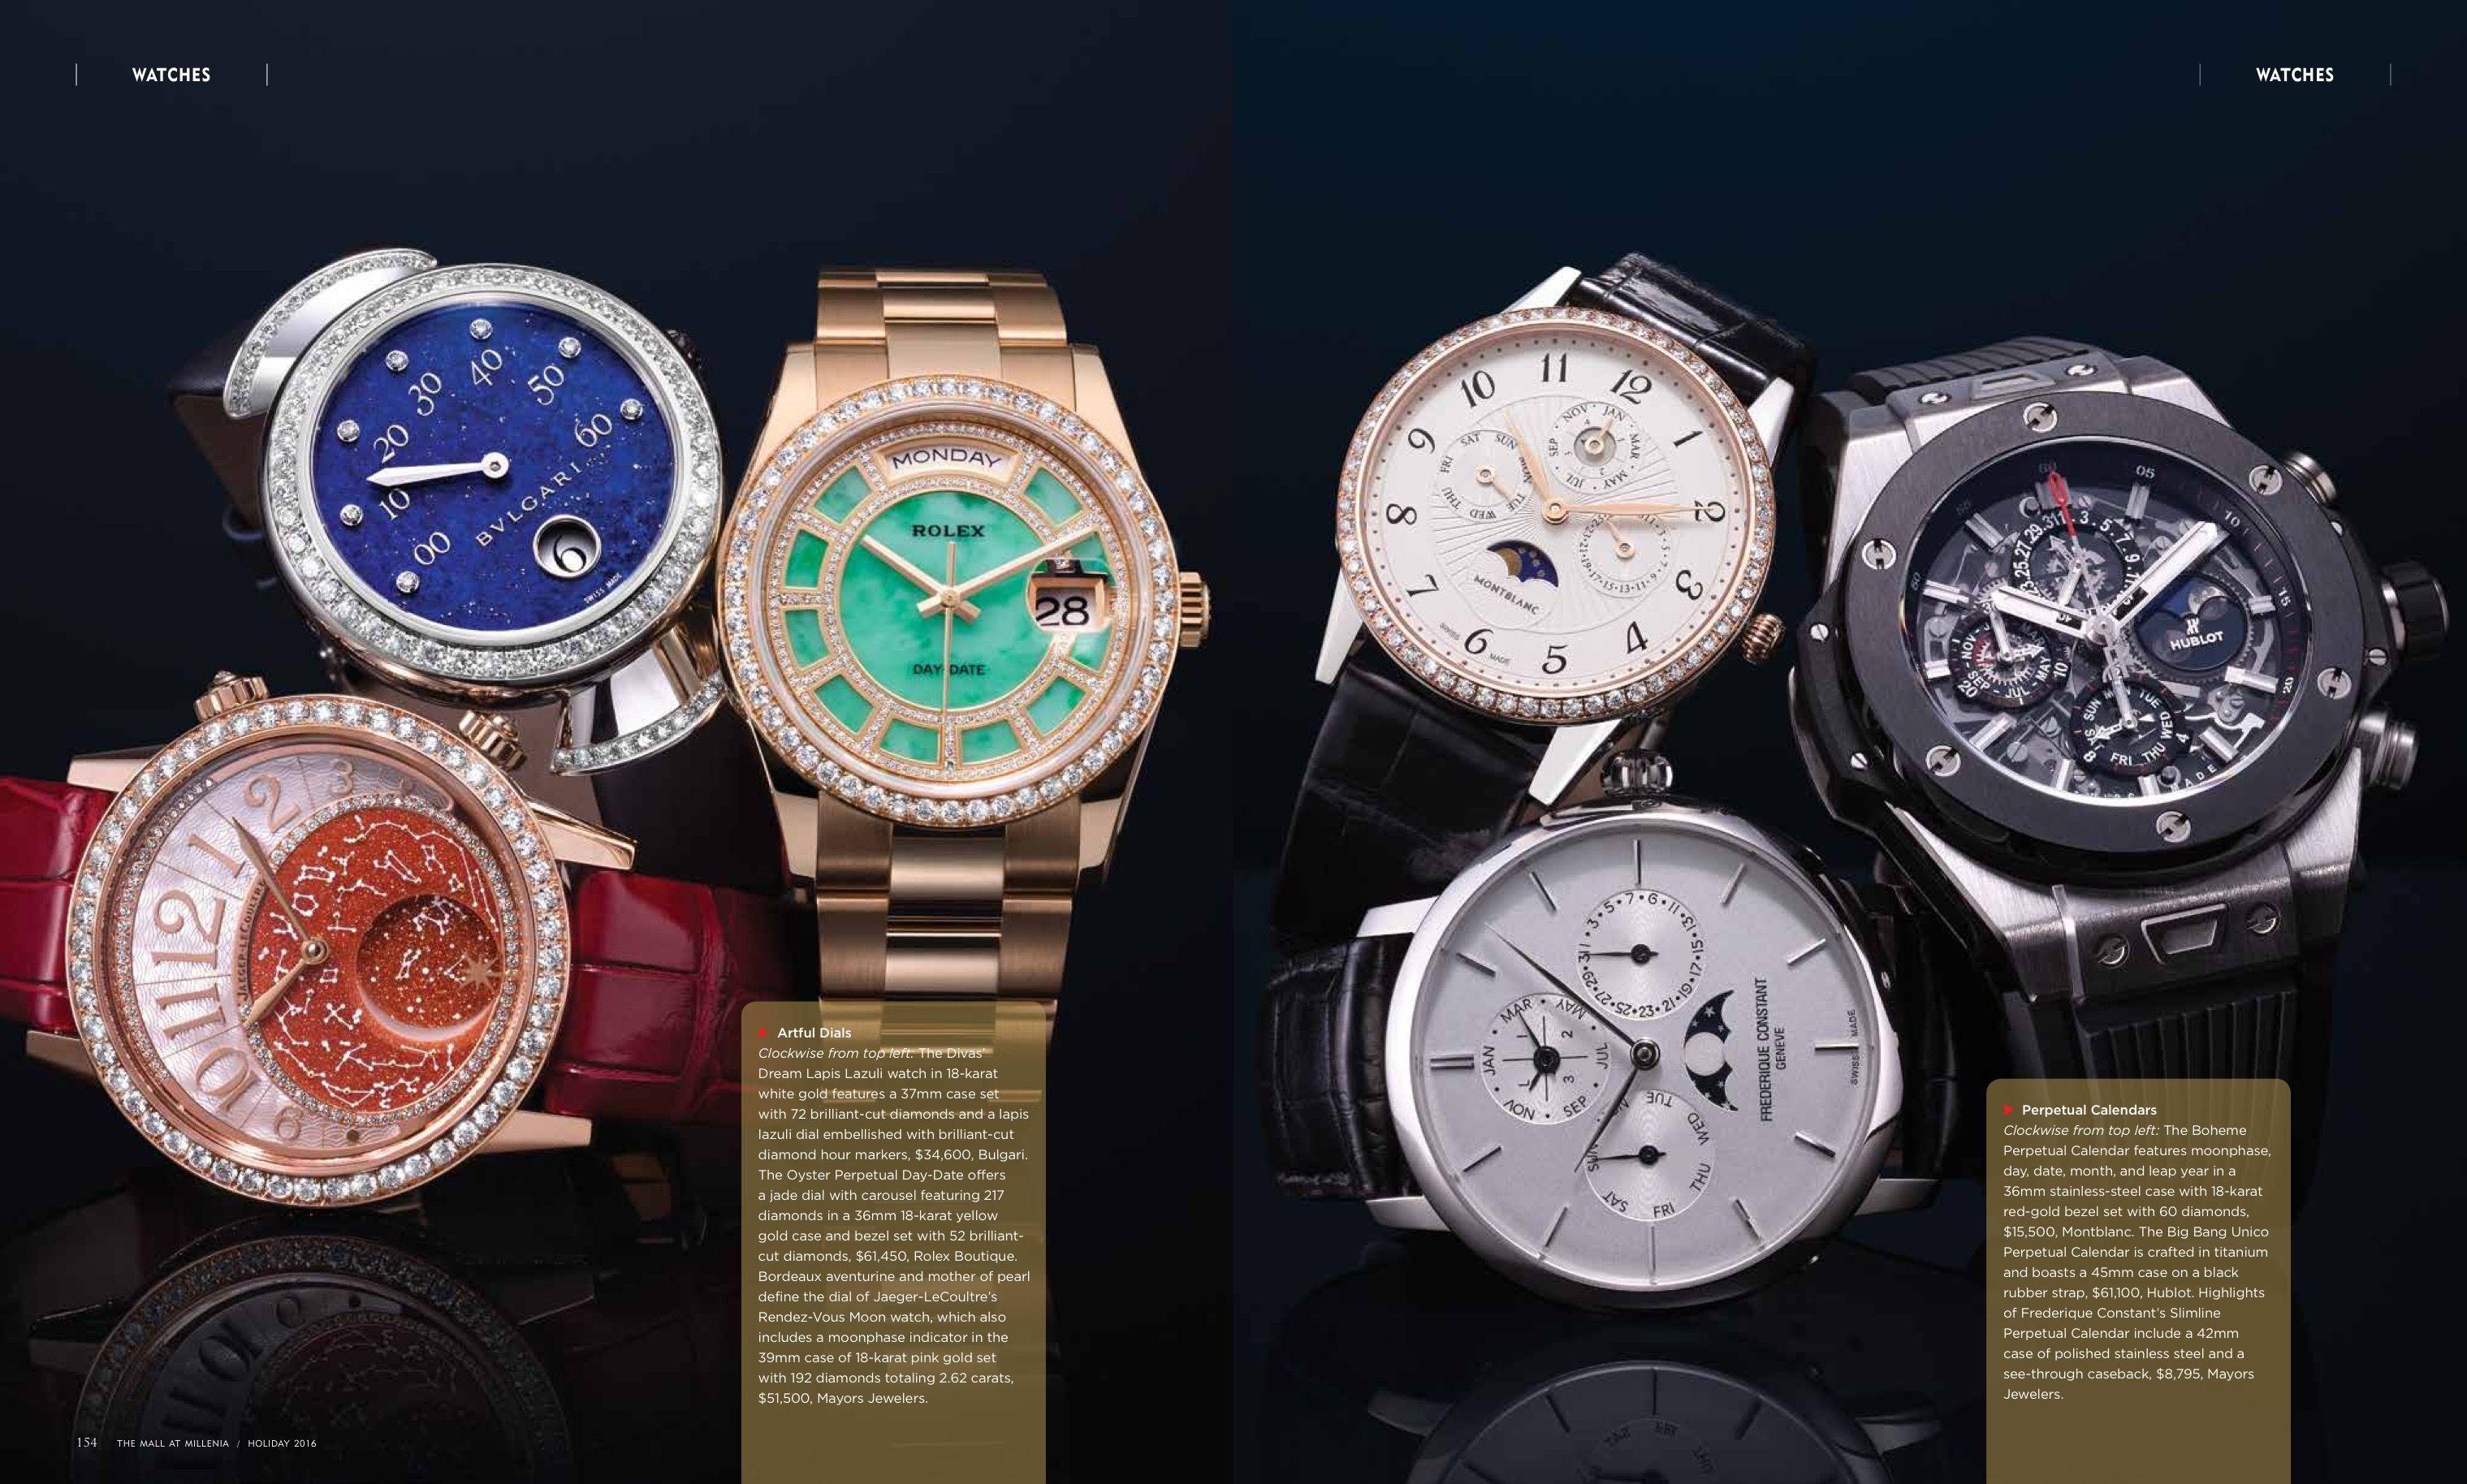 Millenia2016_Watches (dragged) 1.jpg